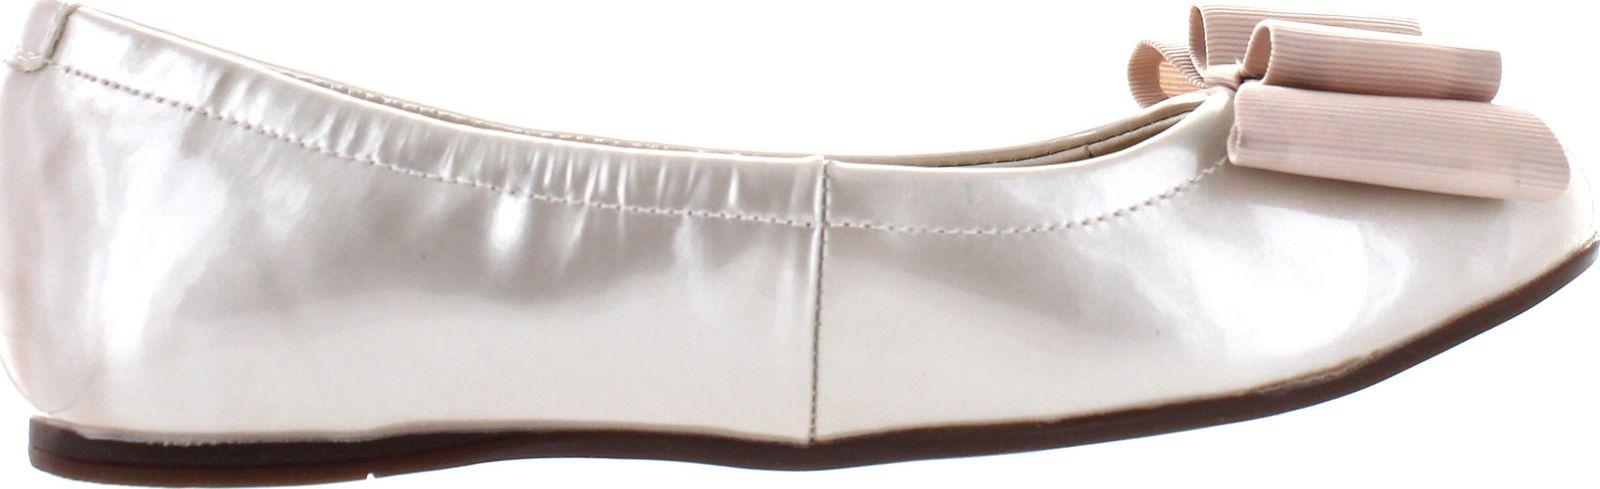 Venettini Girls 55-Jenifer Leather Dress Flats With Bow